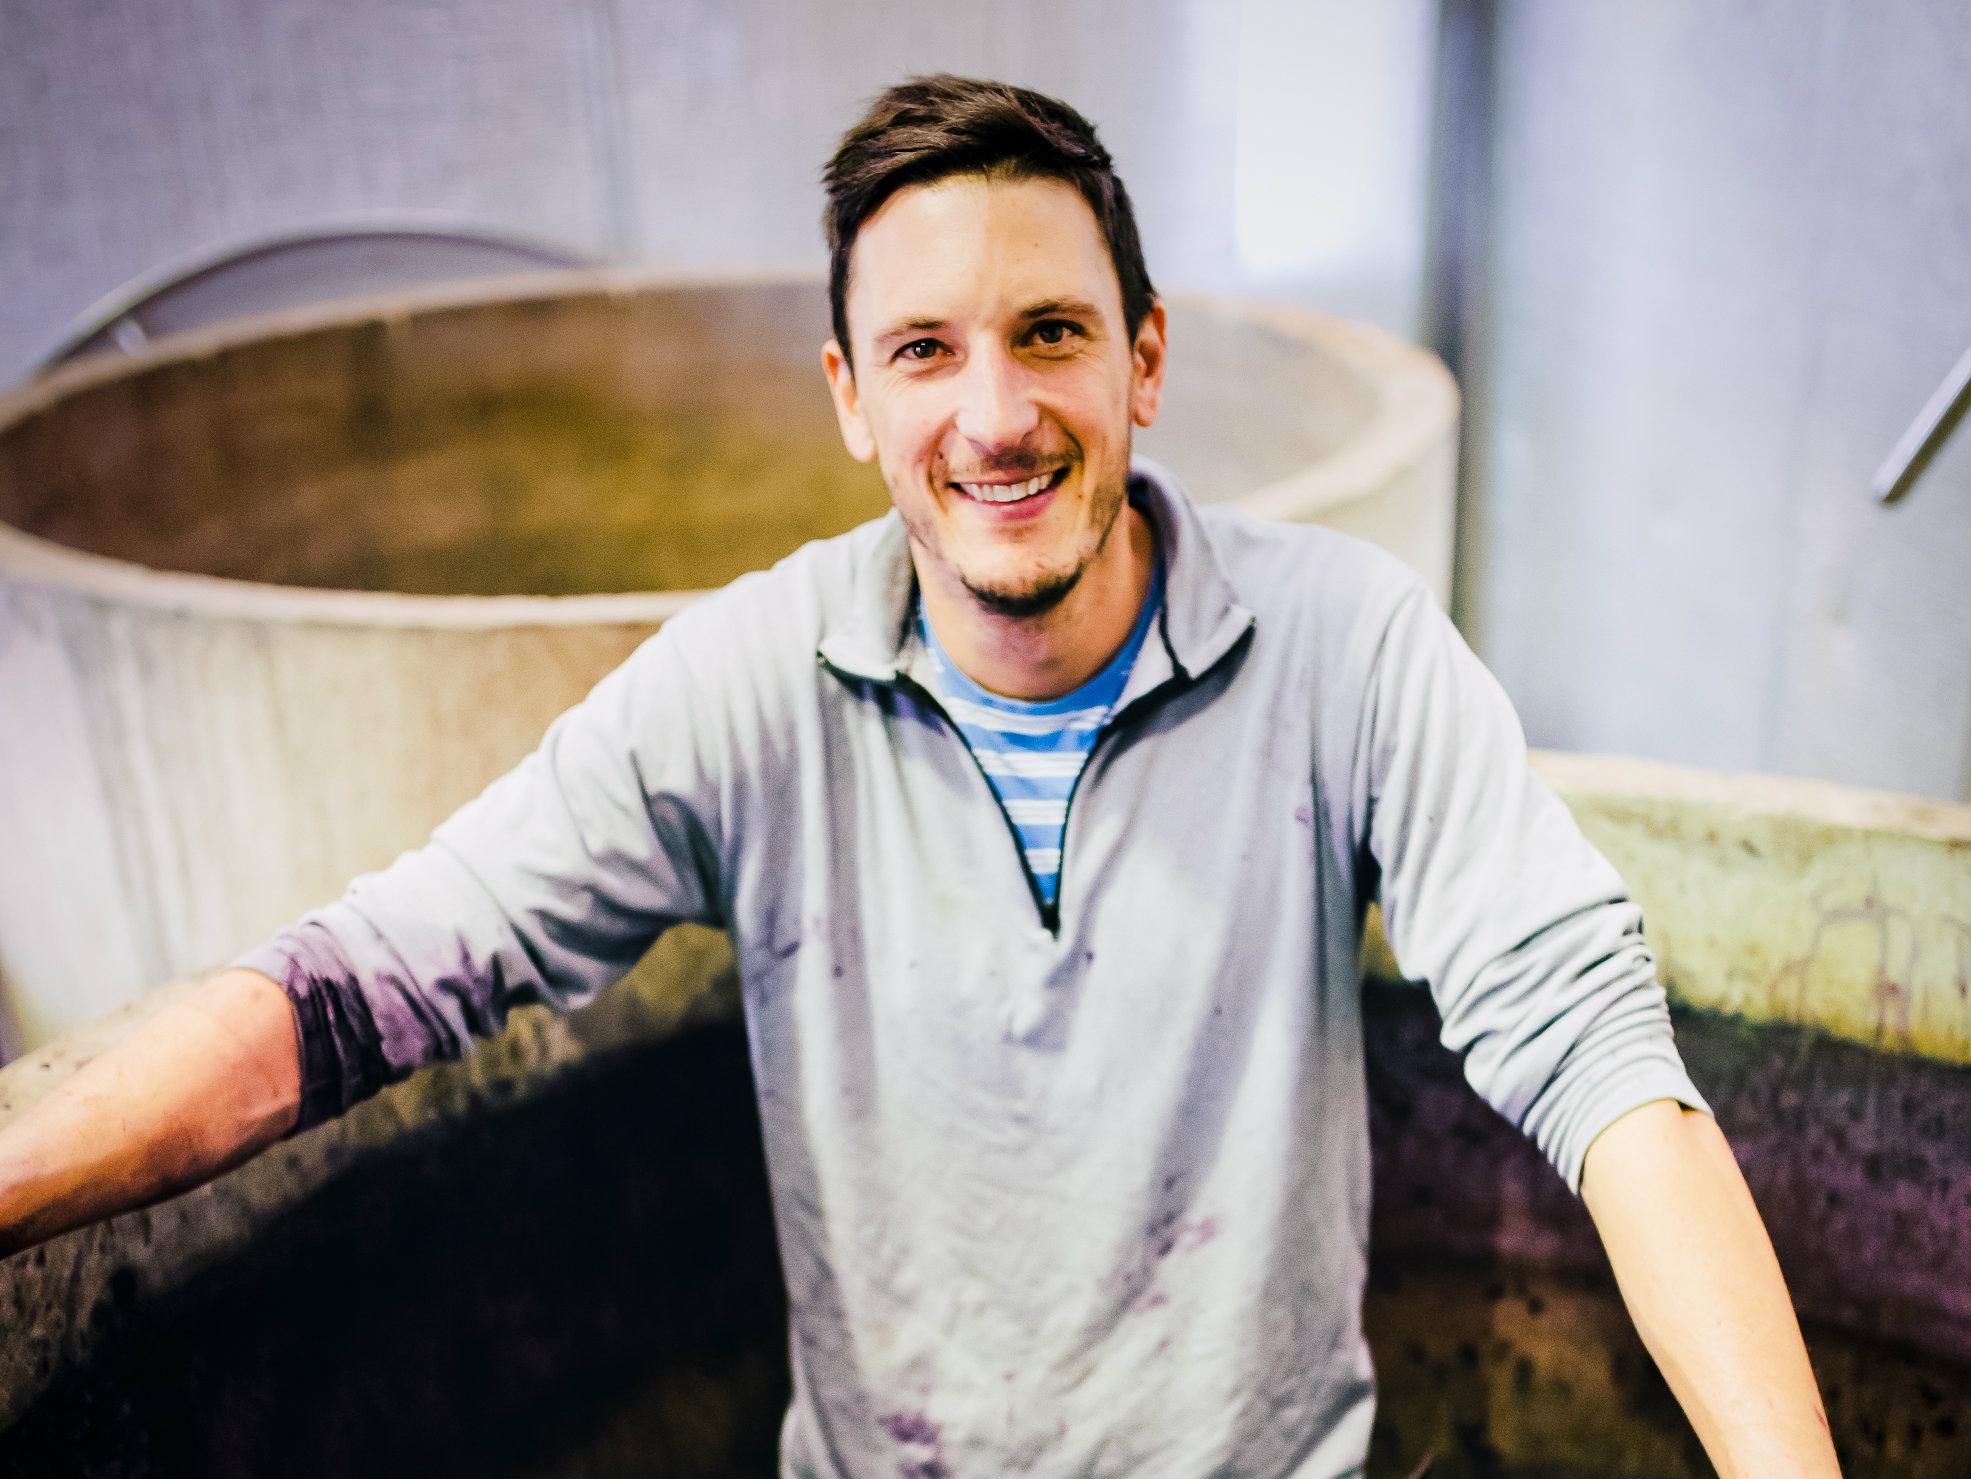 Winemaker Rowly Milhinch